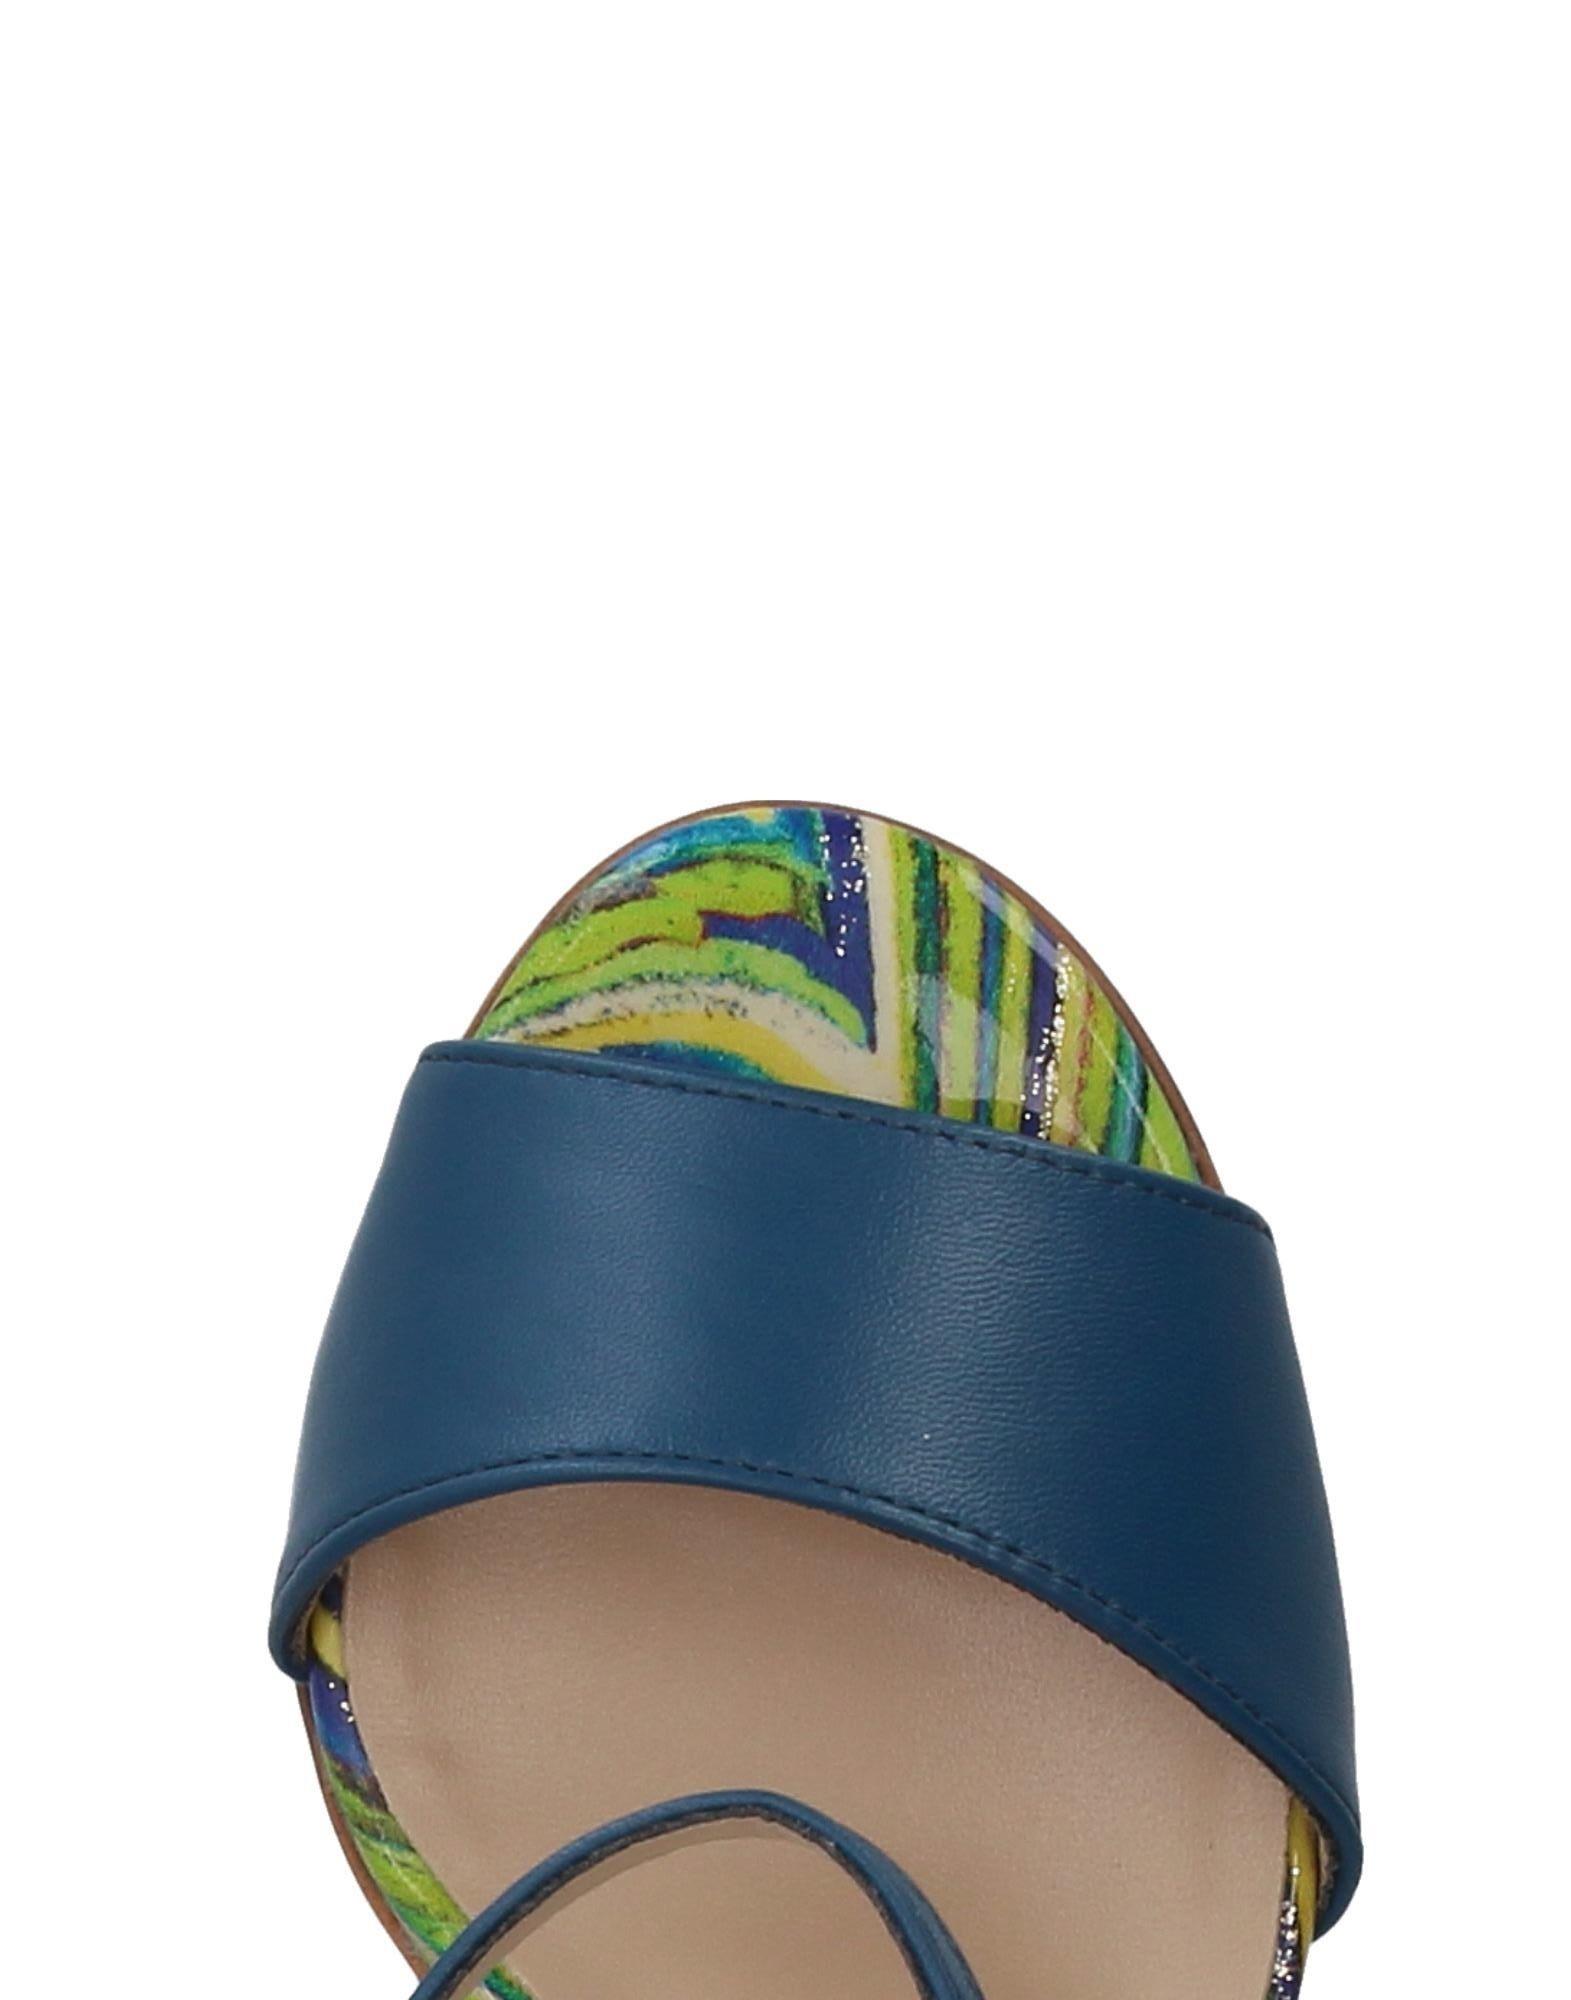 Loretta By Loretta Sandalen Damen Damen Damen  11374099BW Gute Qualität beliebte Schuhe 3eabd7